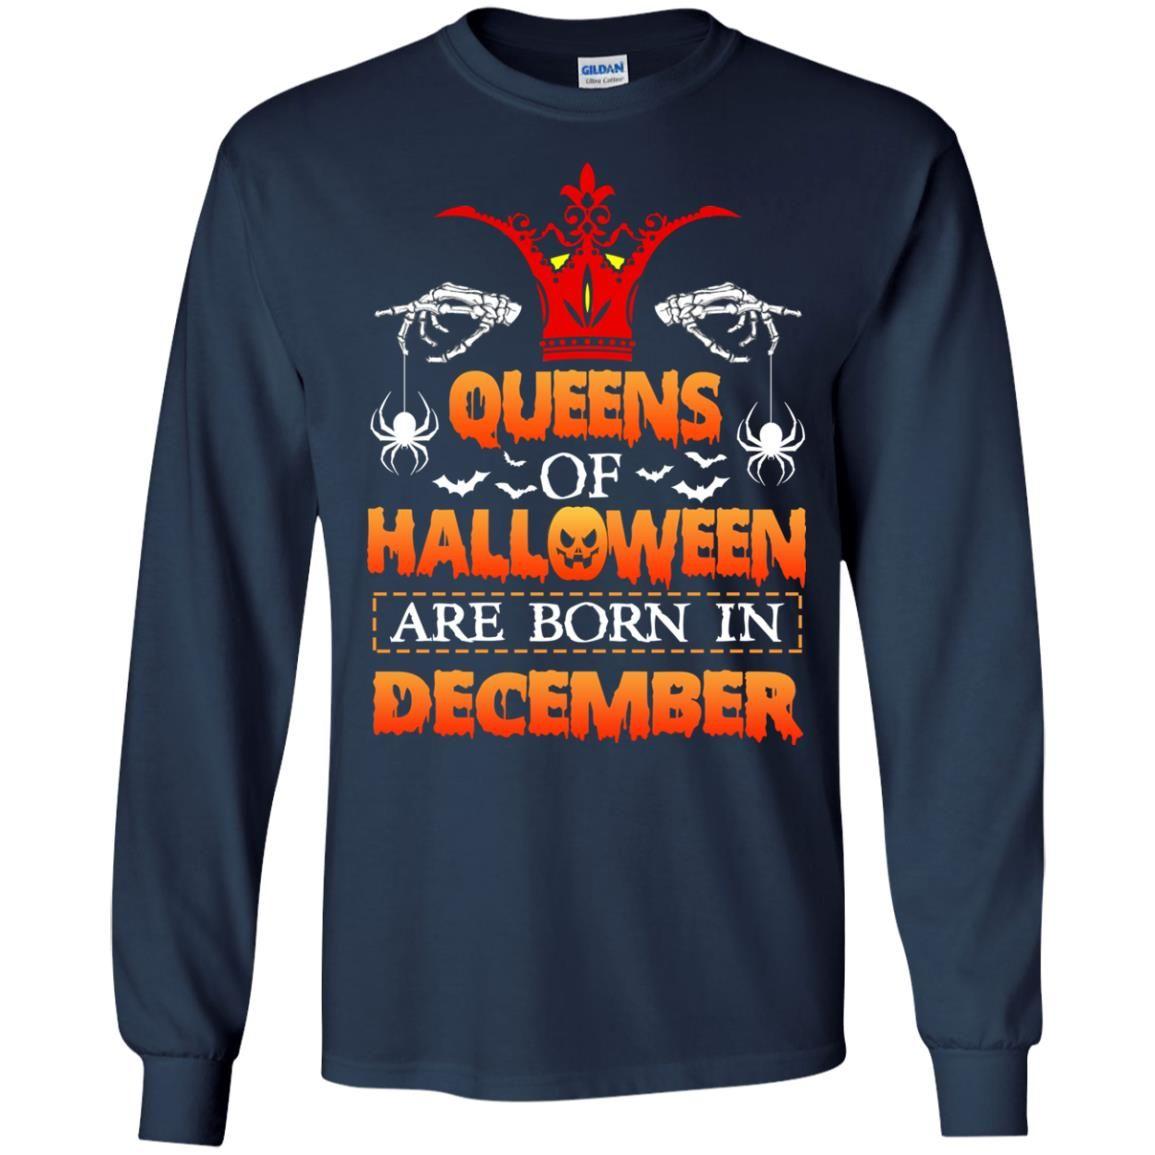 image 963 - Queens of Halloween are born in December shirt, tank top, hoodie